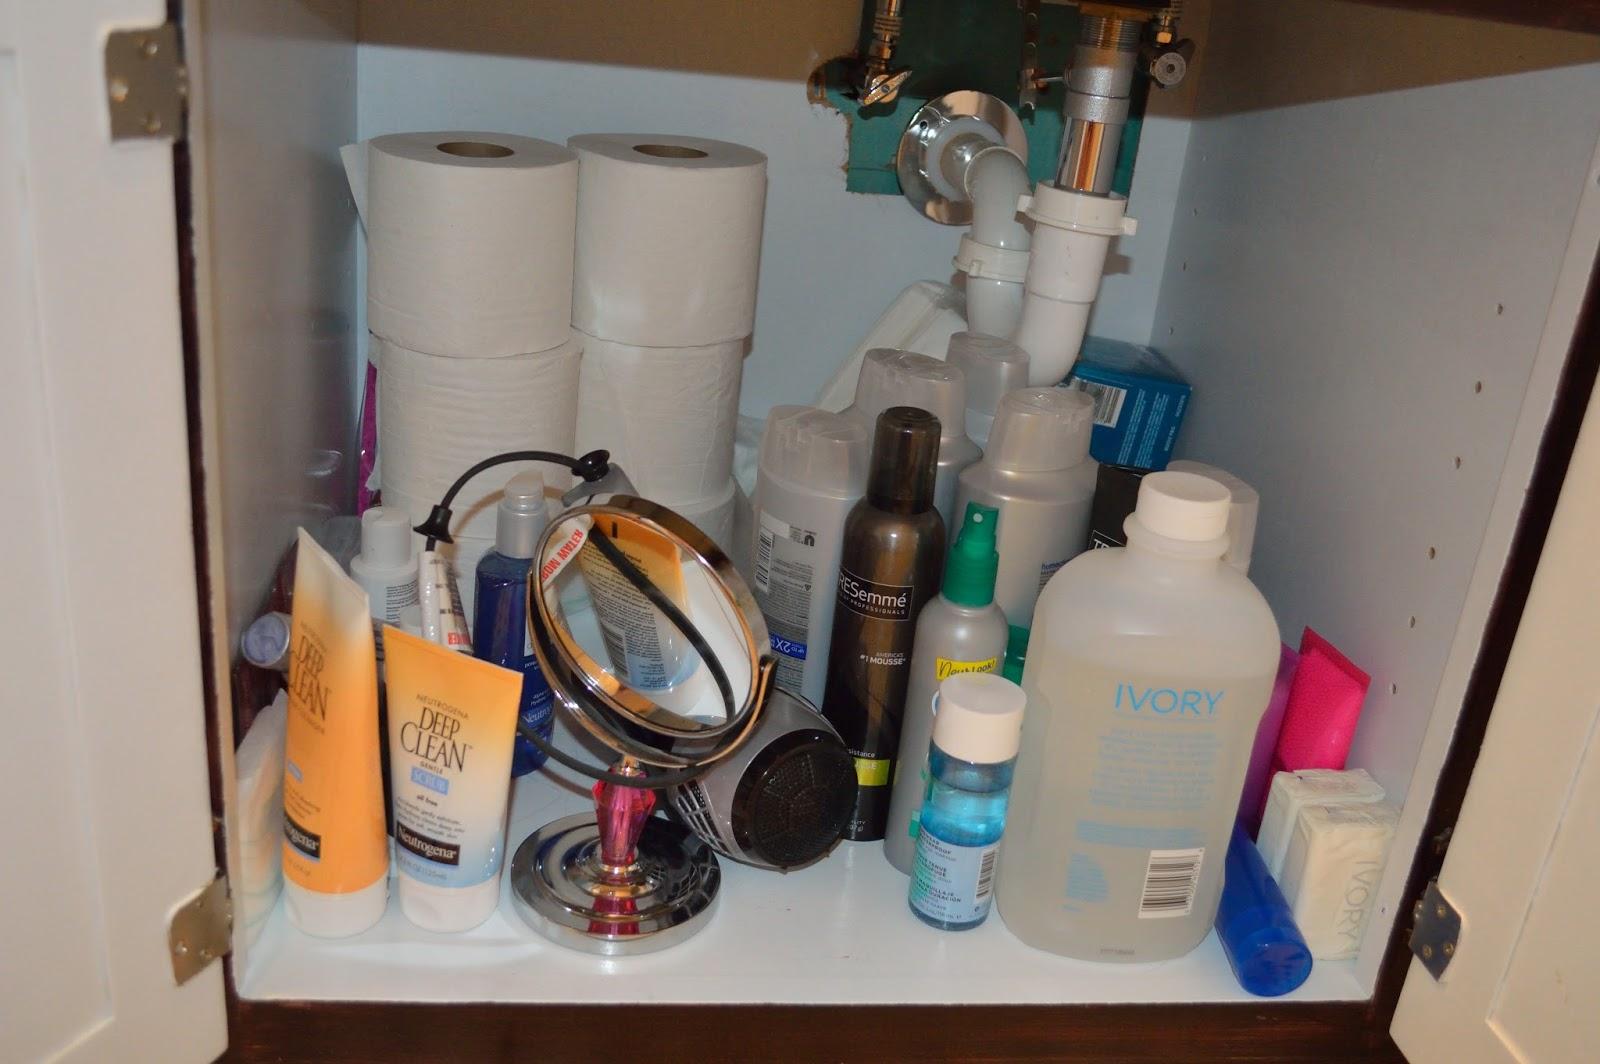 Easy Ways To Organize A Messy Bathroom